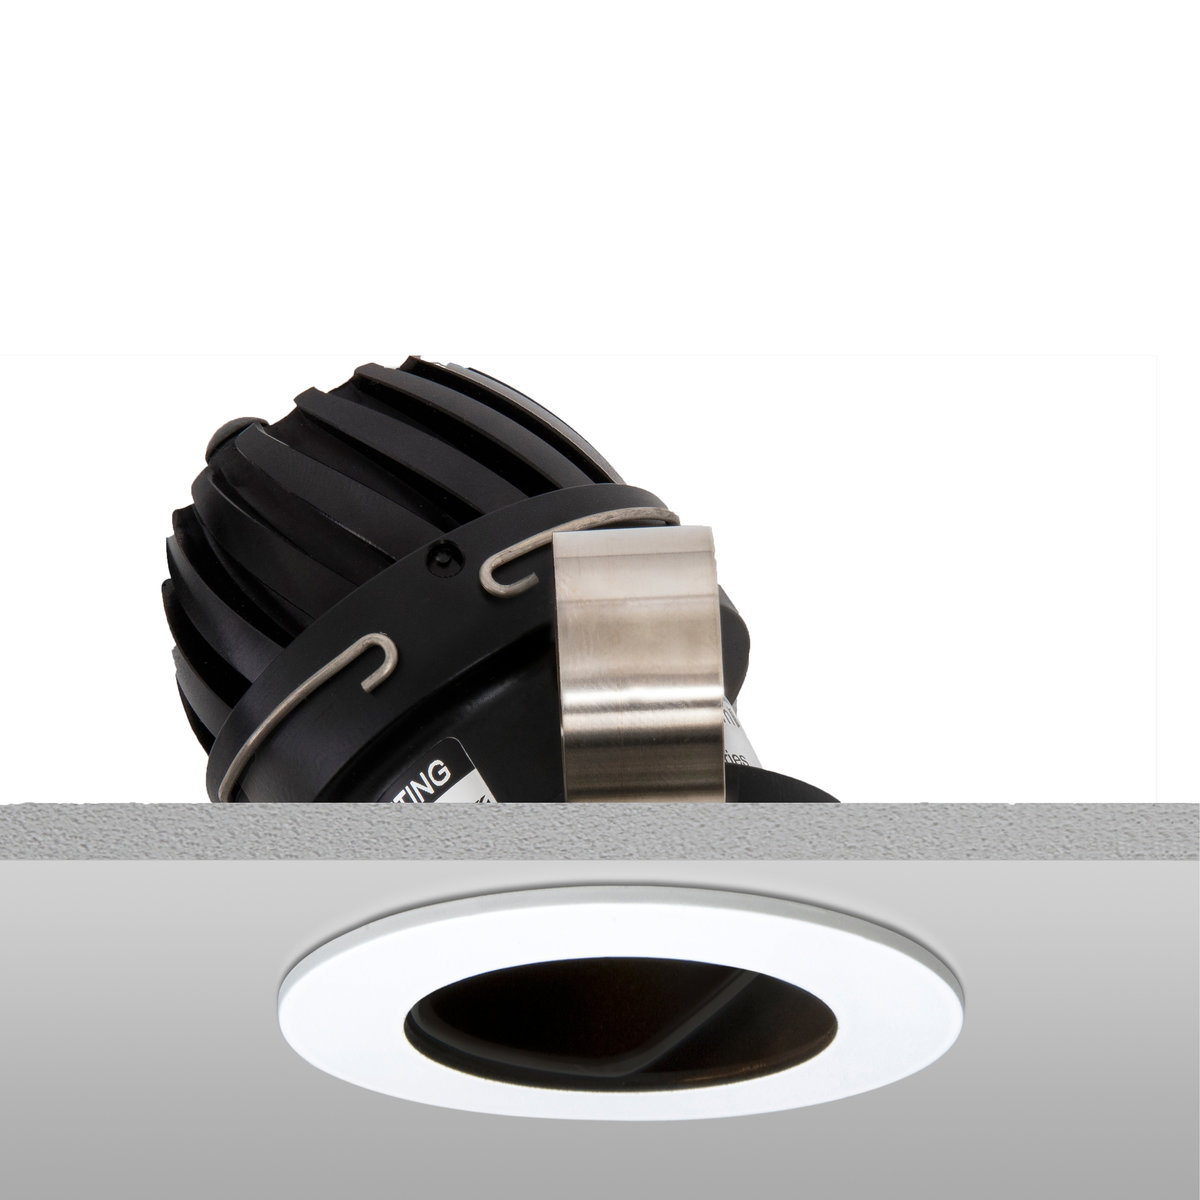 Flush 50 Downlight main image